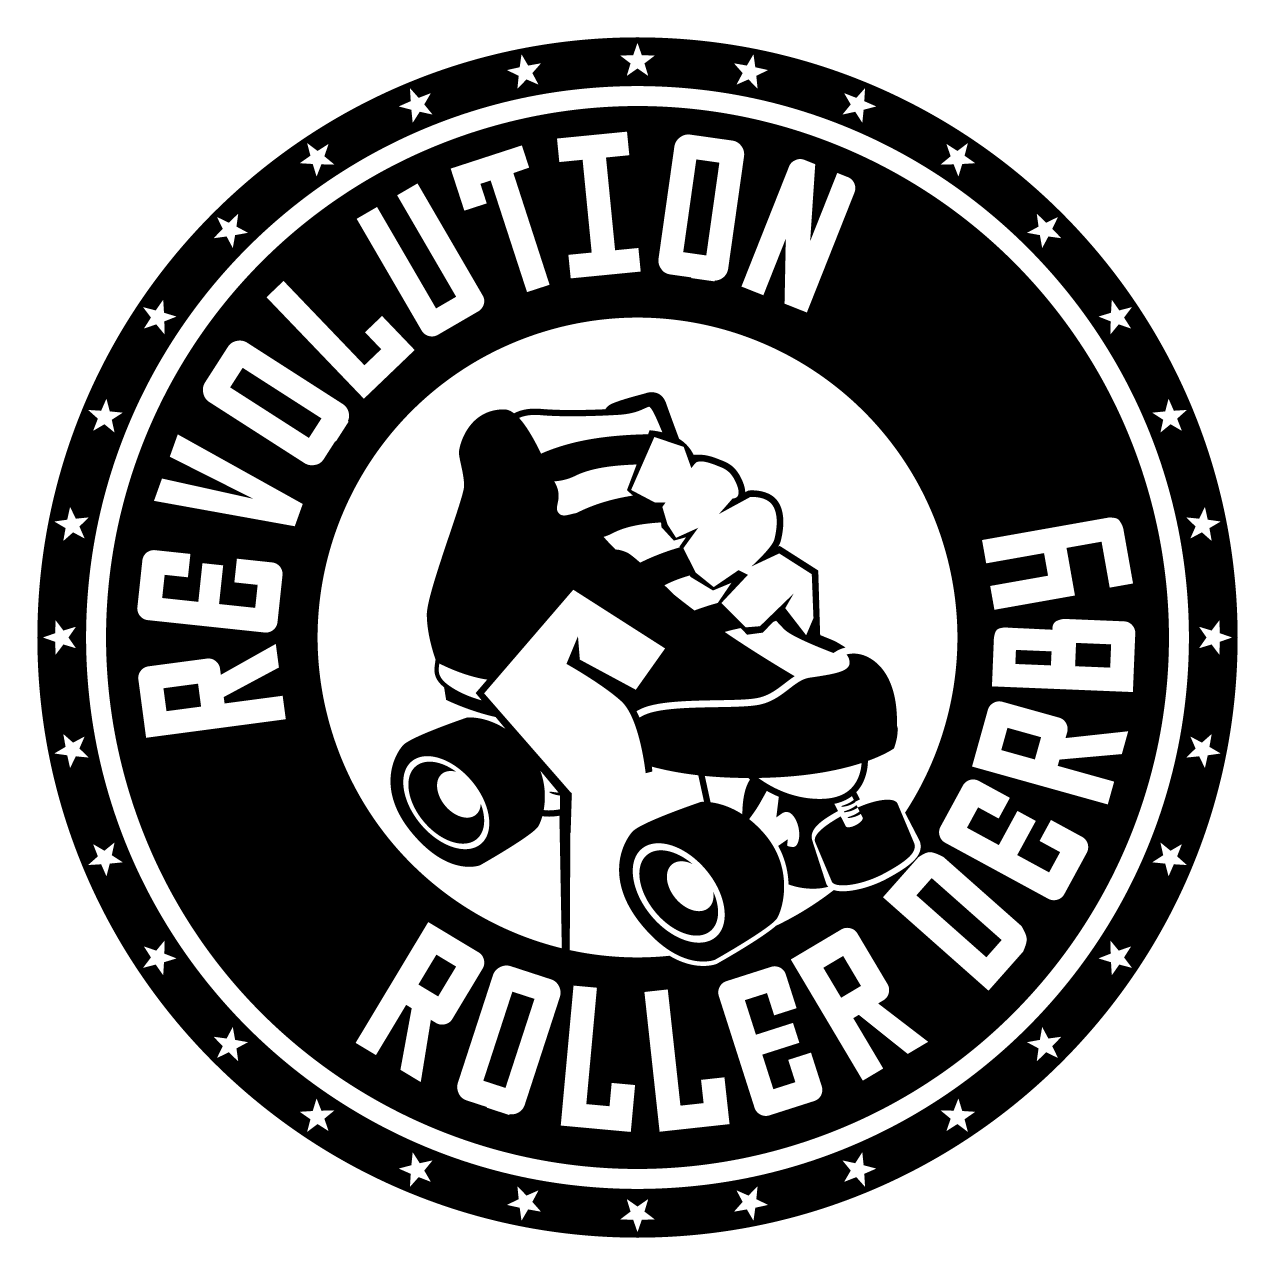 Revolution Roller Derby